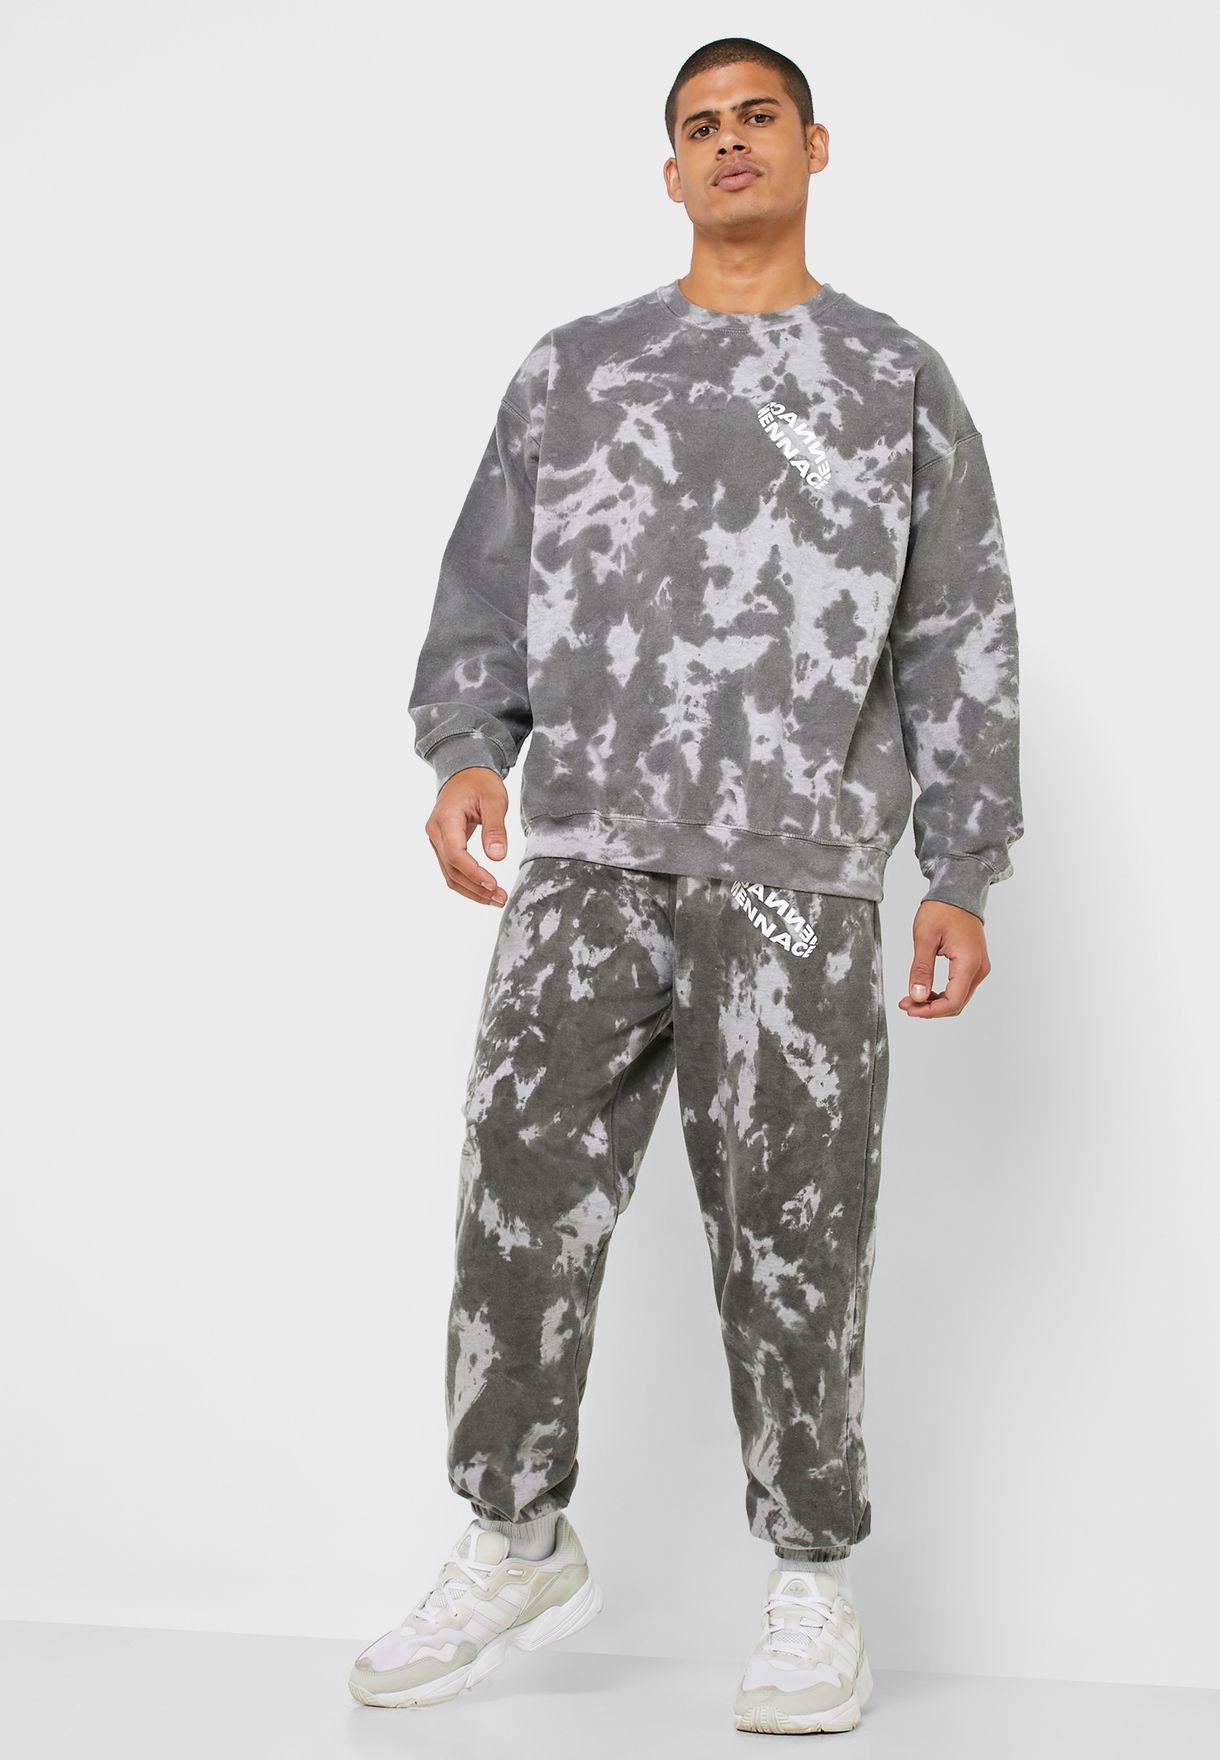 Back Print Tie Dye Sweatshirt